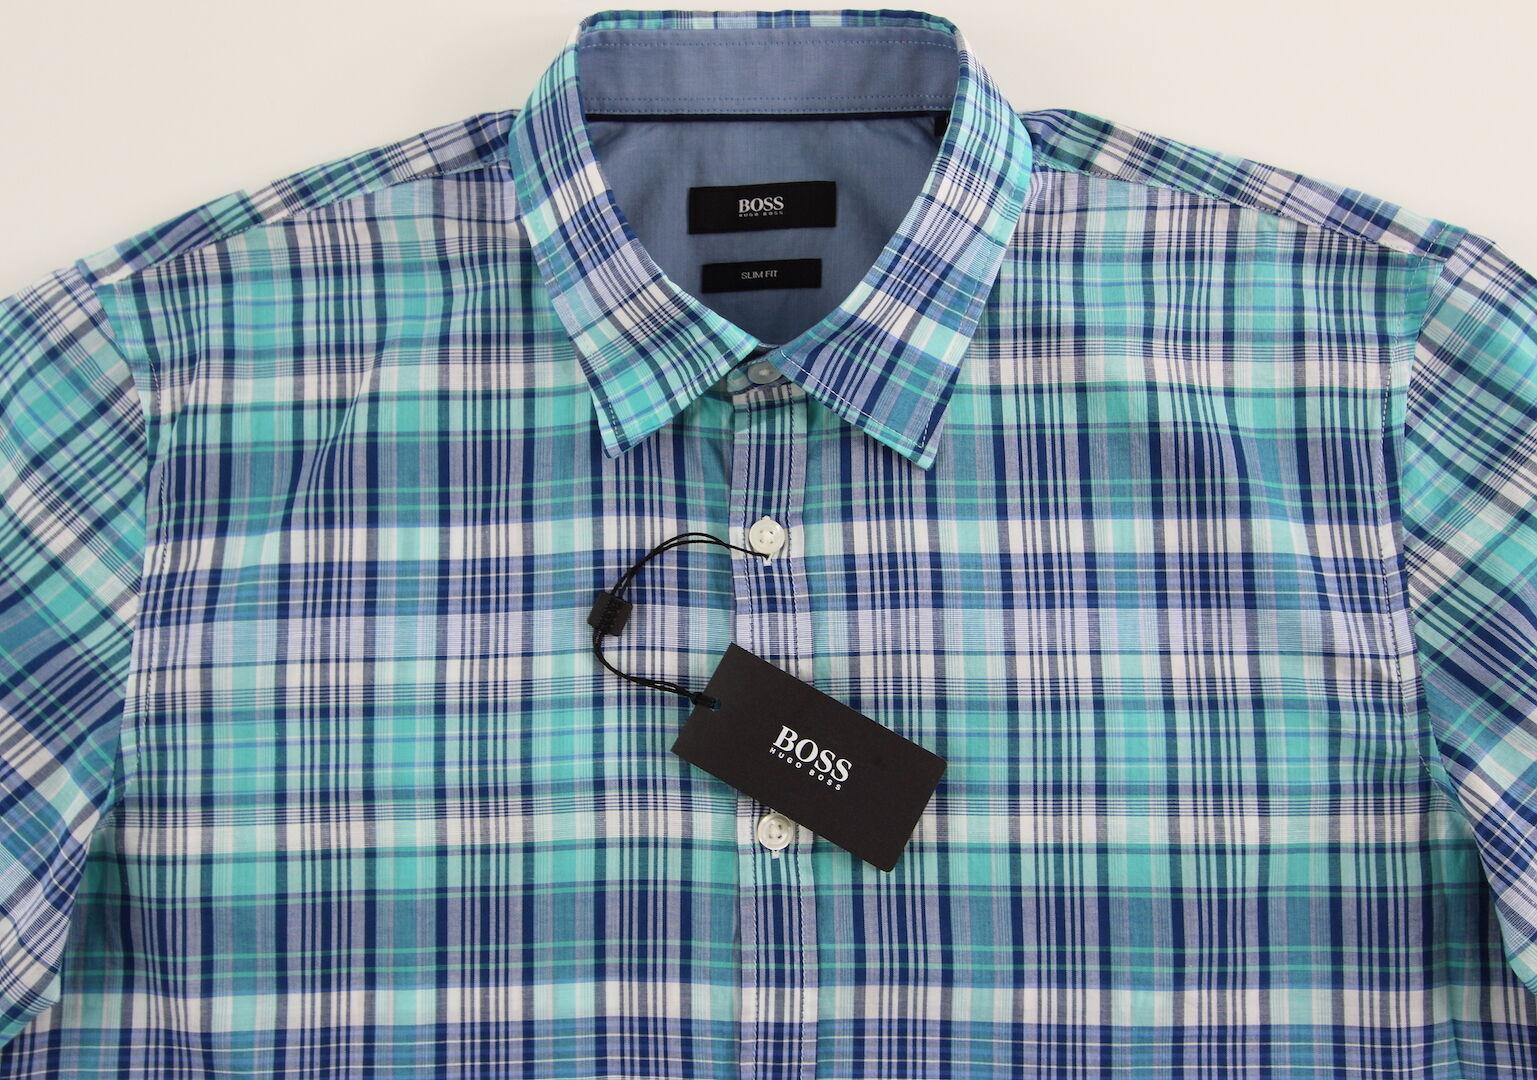 Men's HUGO BOSS White Aqua Navy Plaid Short Sleeve S S Shirt Medium M NWT NEW